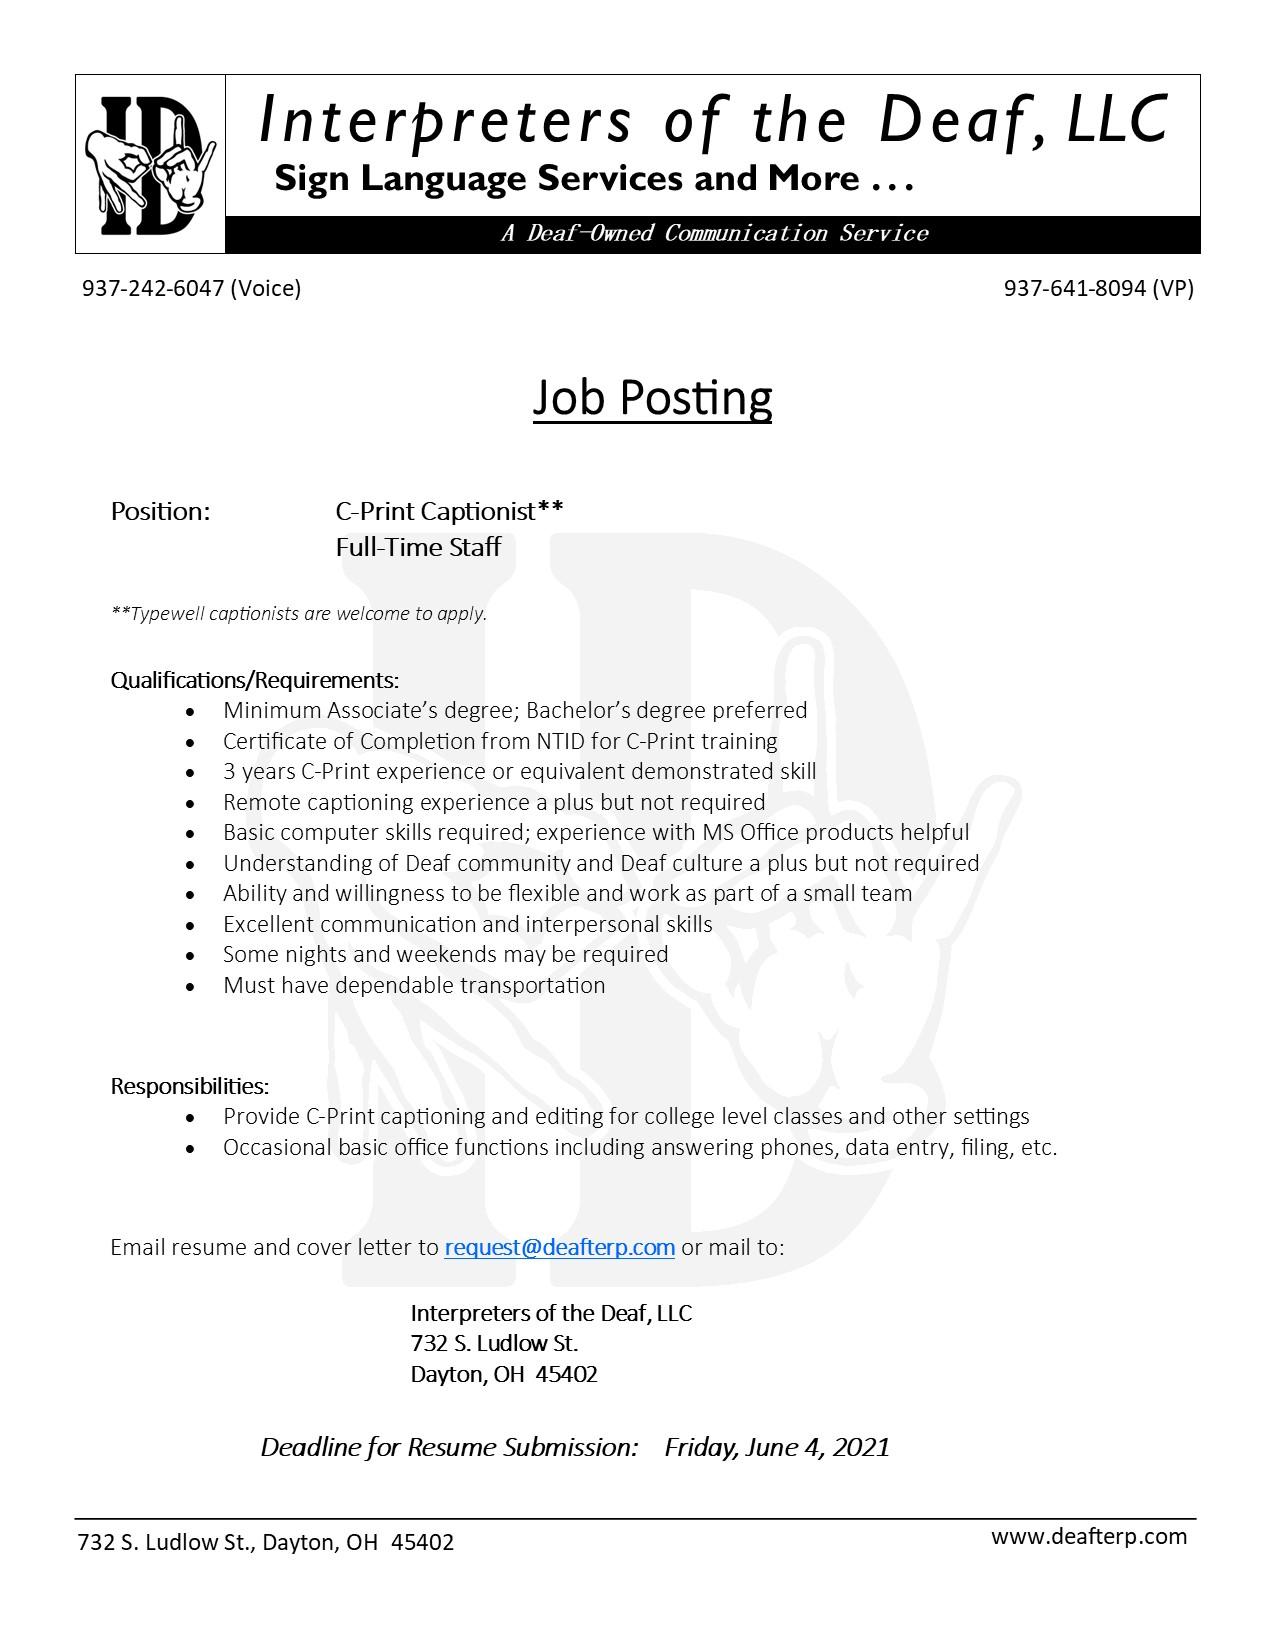 job posting annoucement